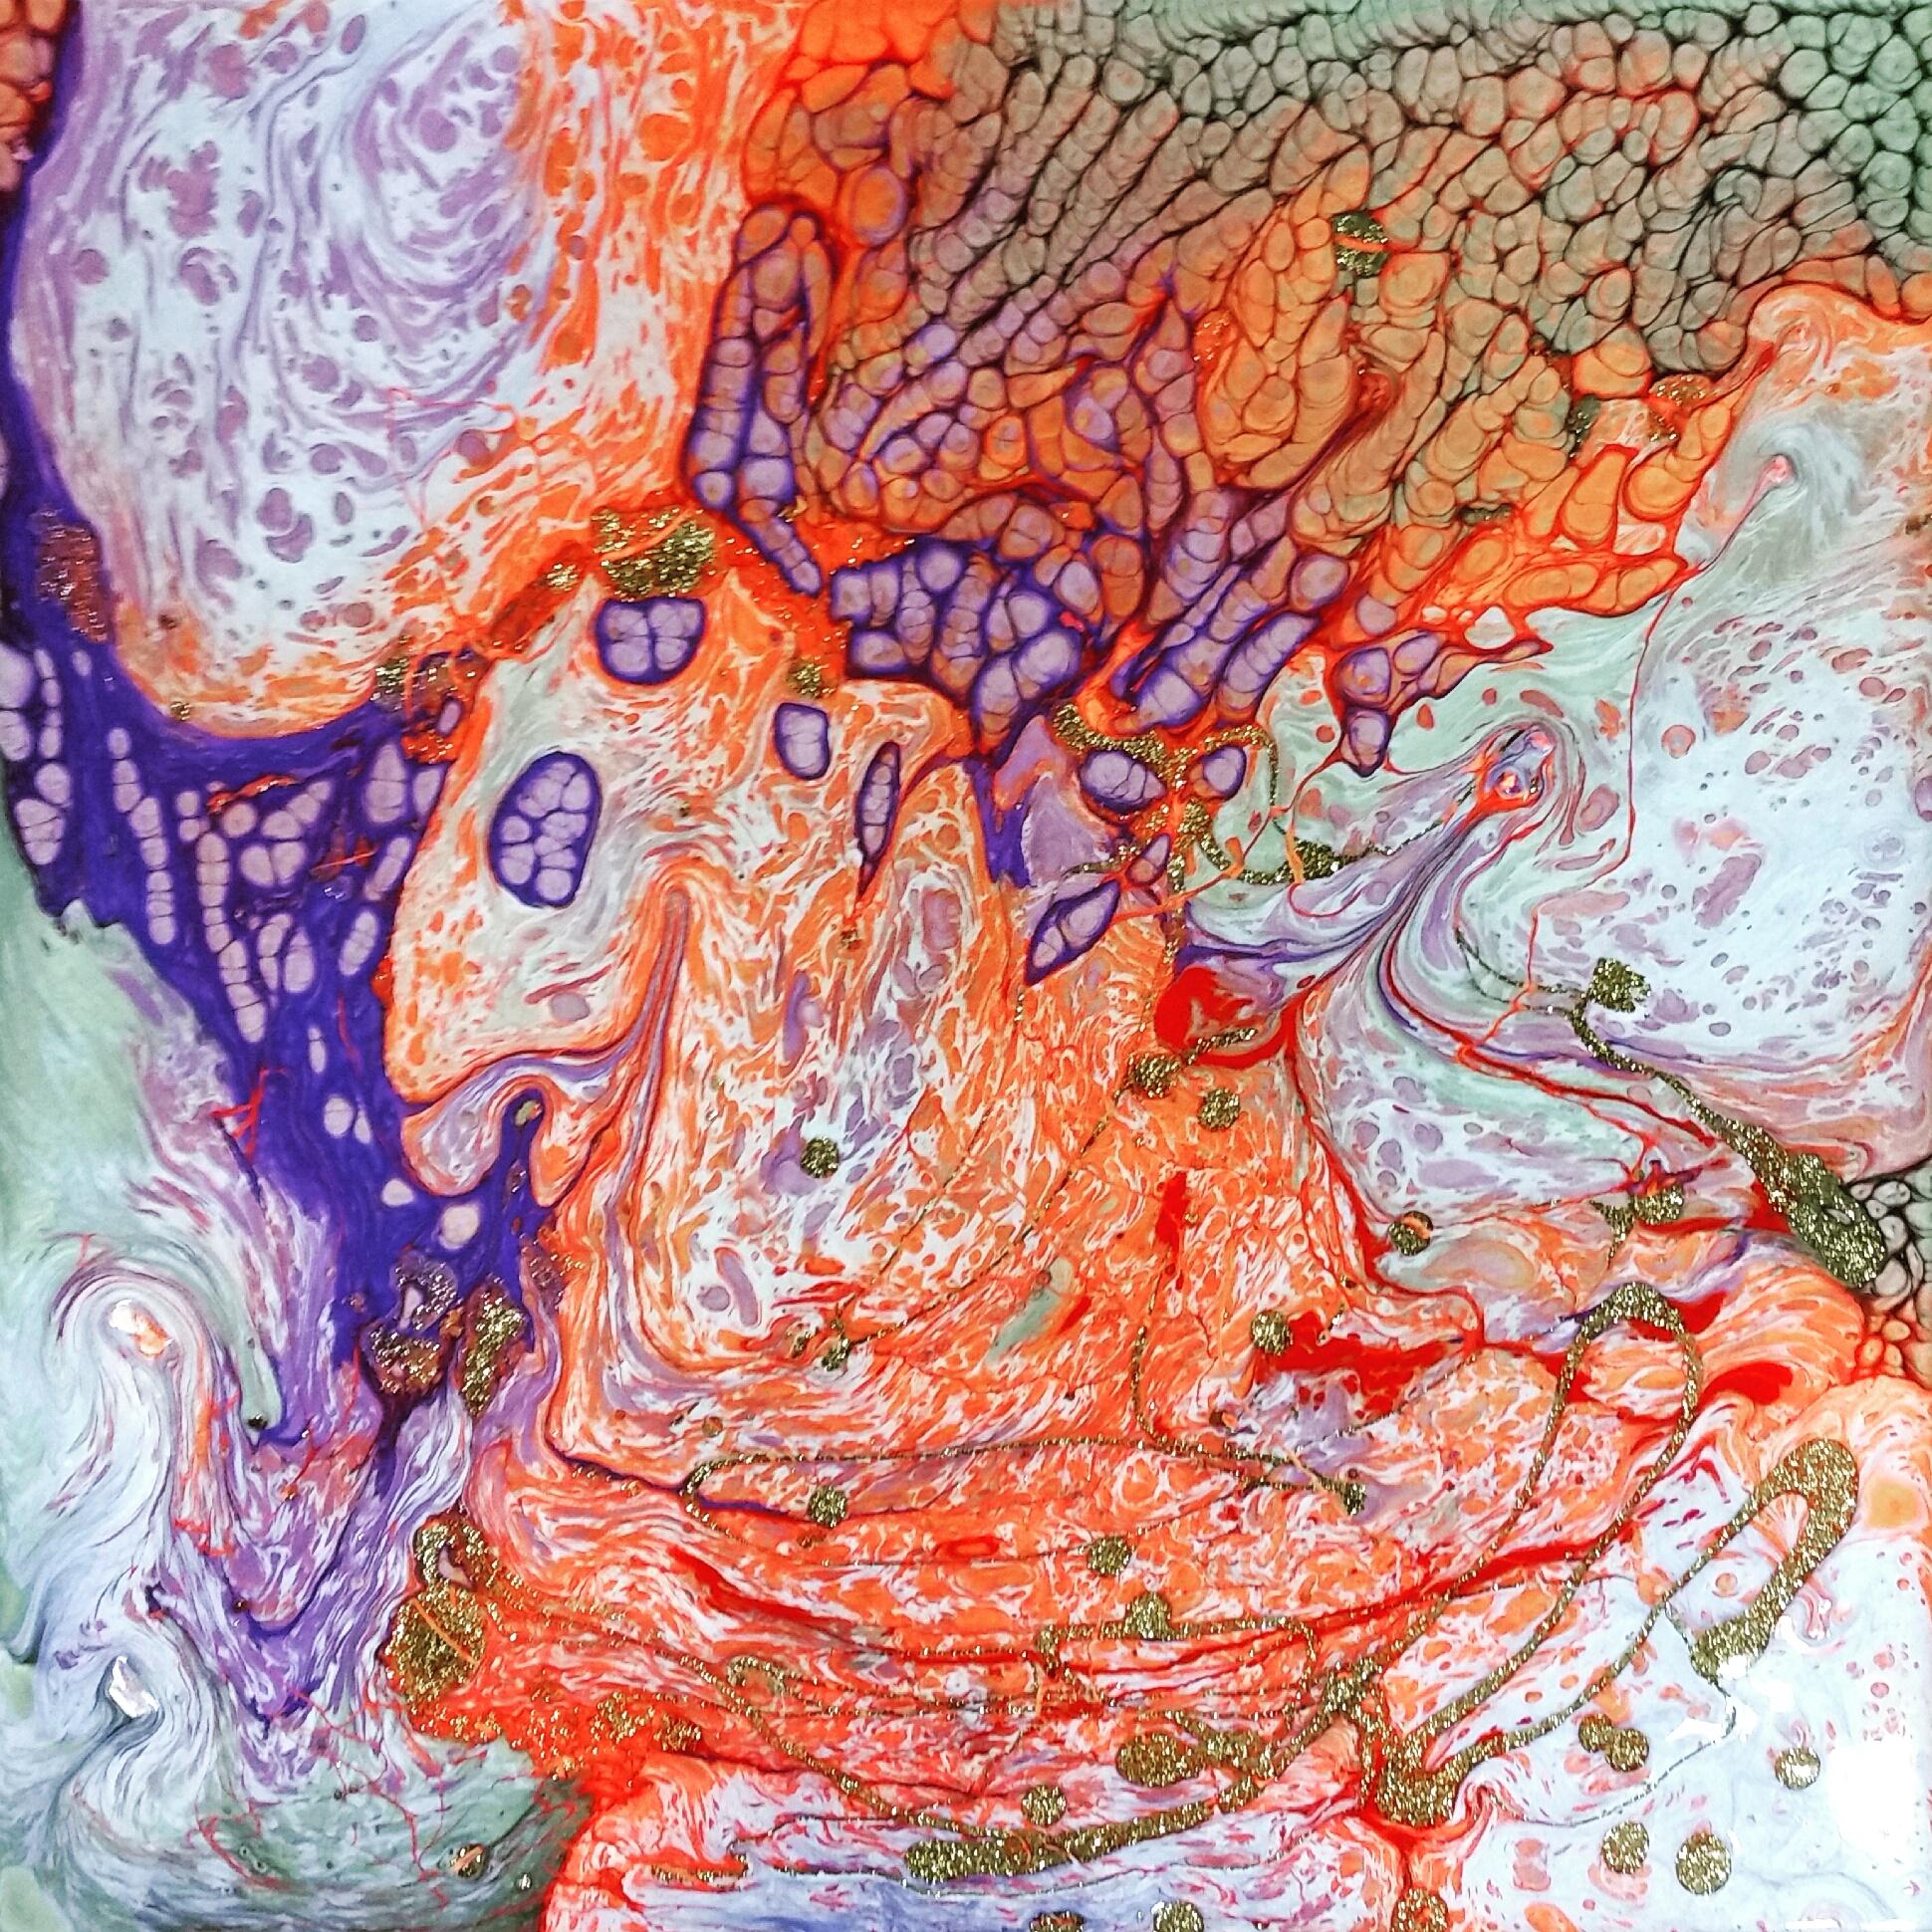 Pebeo Liquid Alkyd Oil paints  (Vitrail, Fantasy Moon, and Fantasy Prisme)  in a Pebeo Liquid Art Panel.